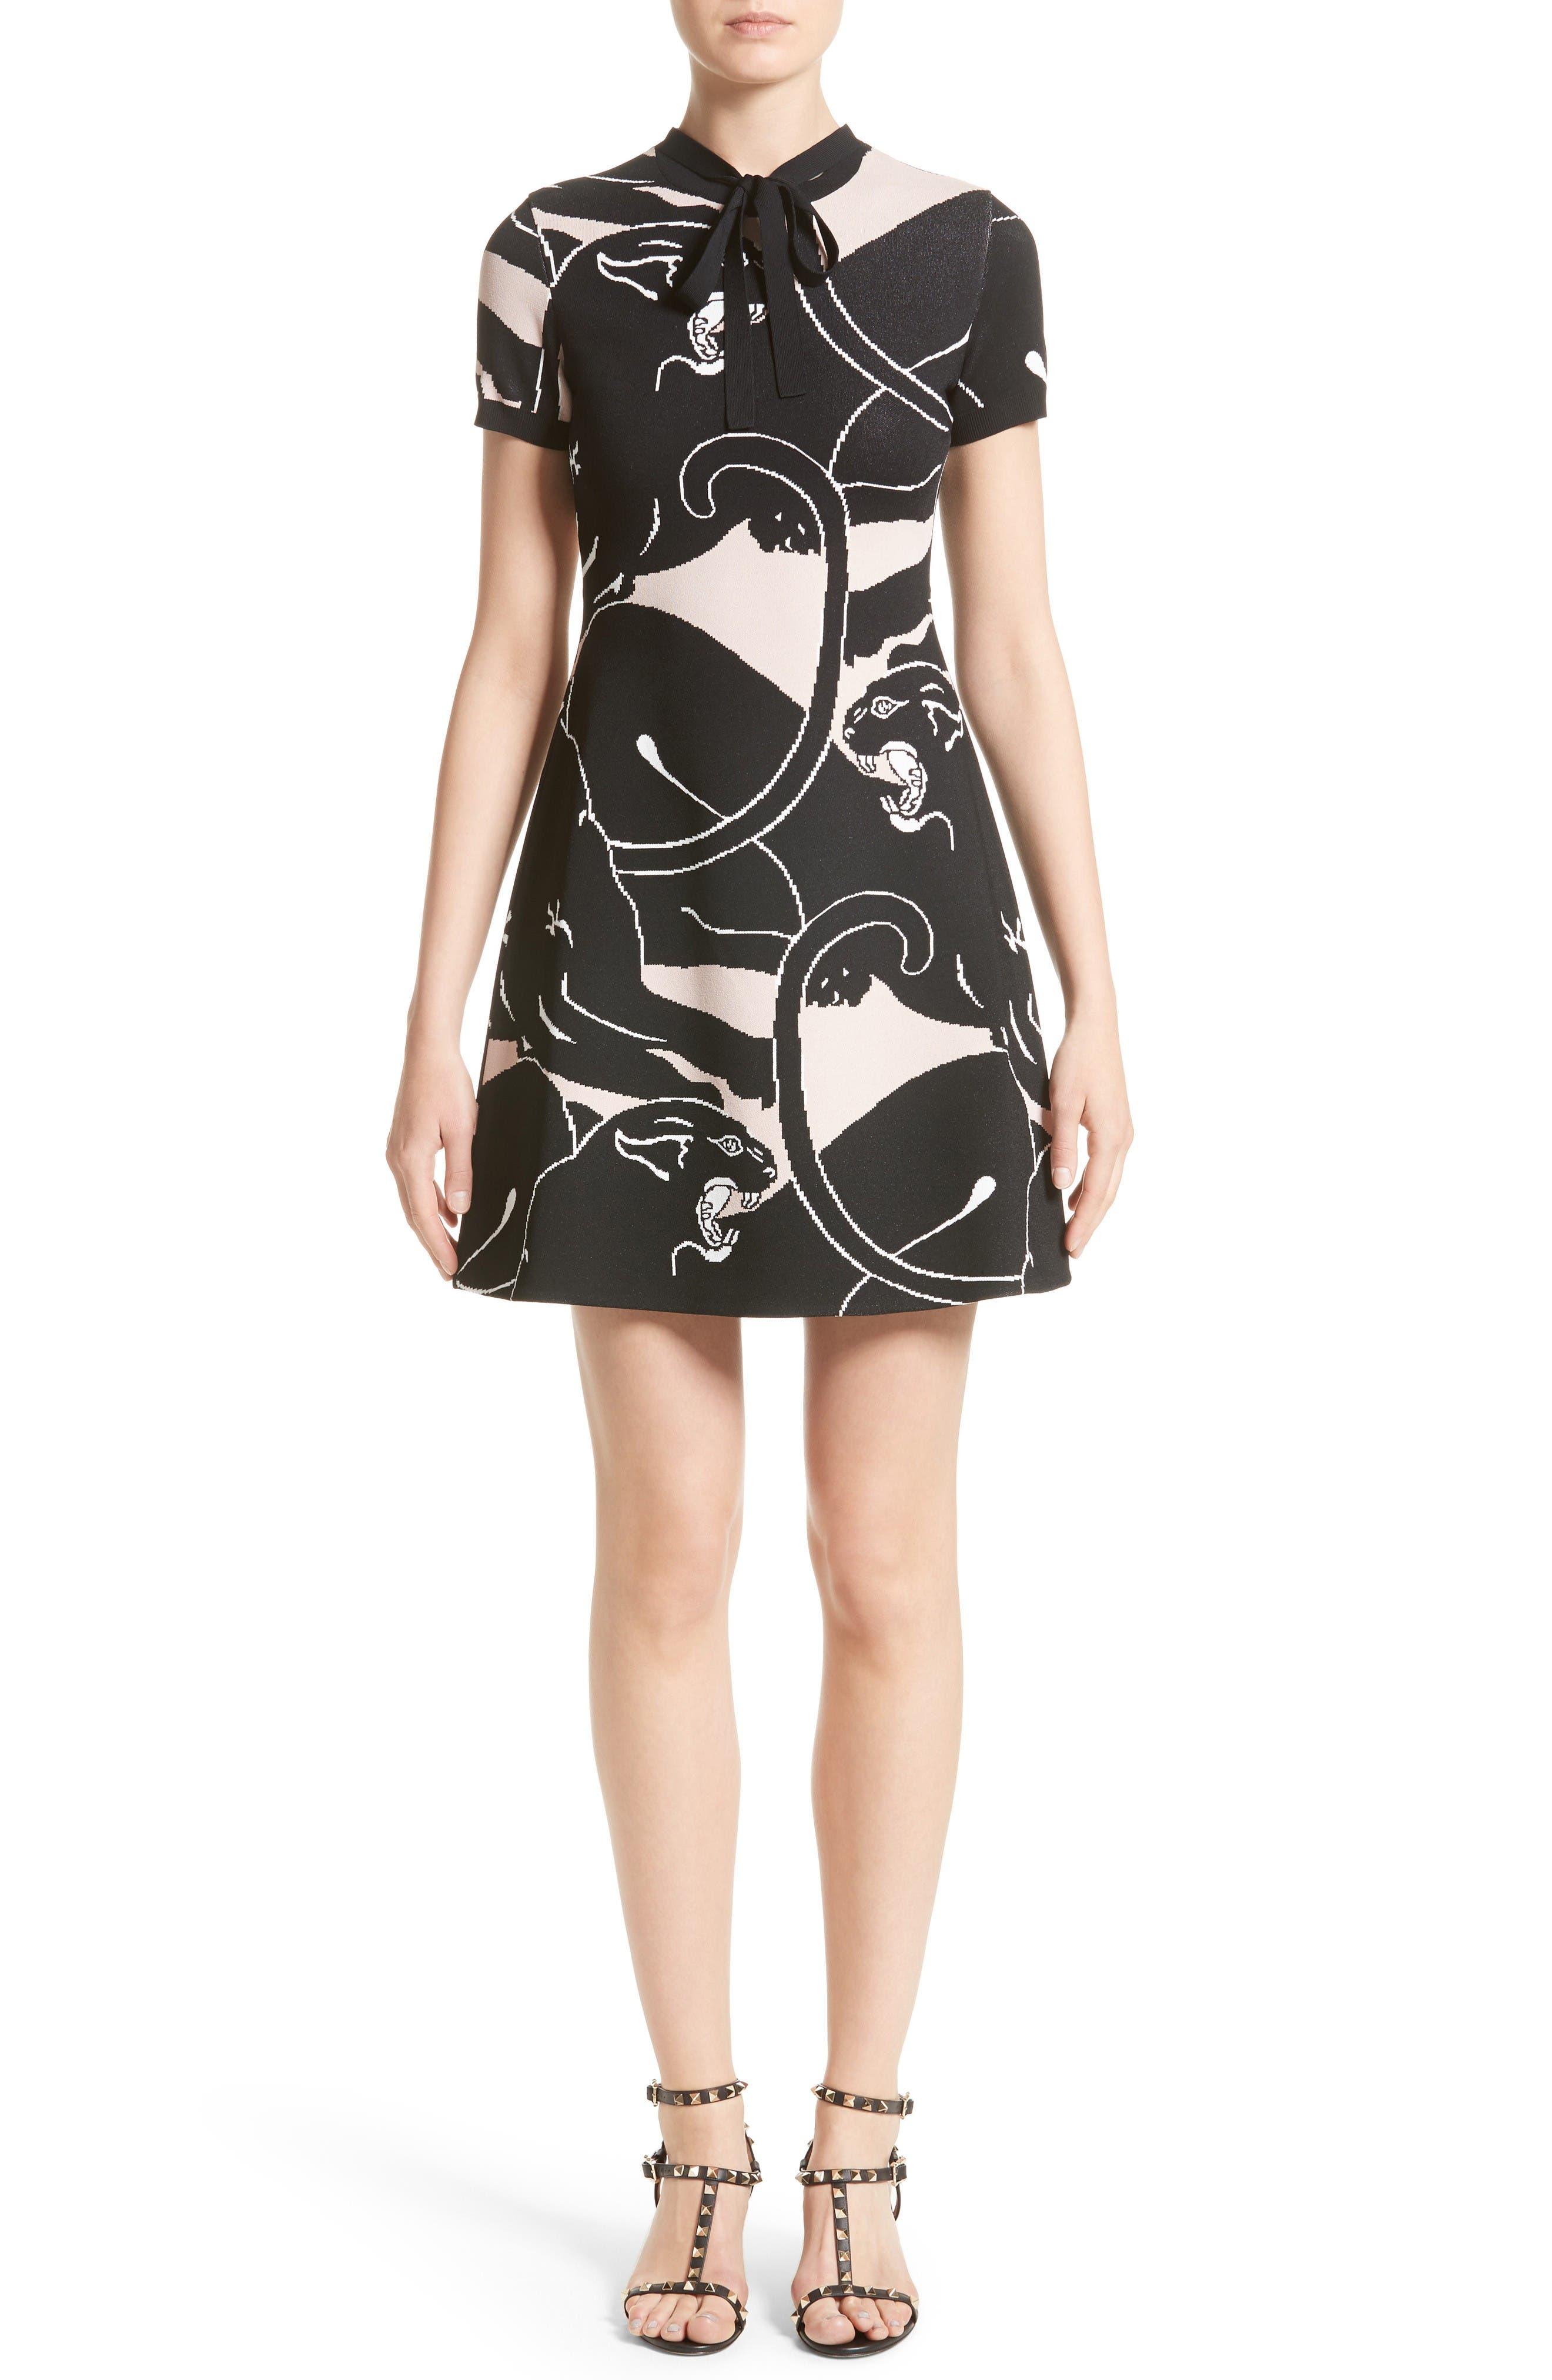 Alternate Image 1 Selected - Valentino Jacquard Panther Print Dress